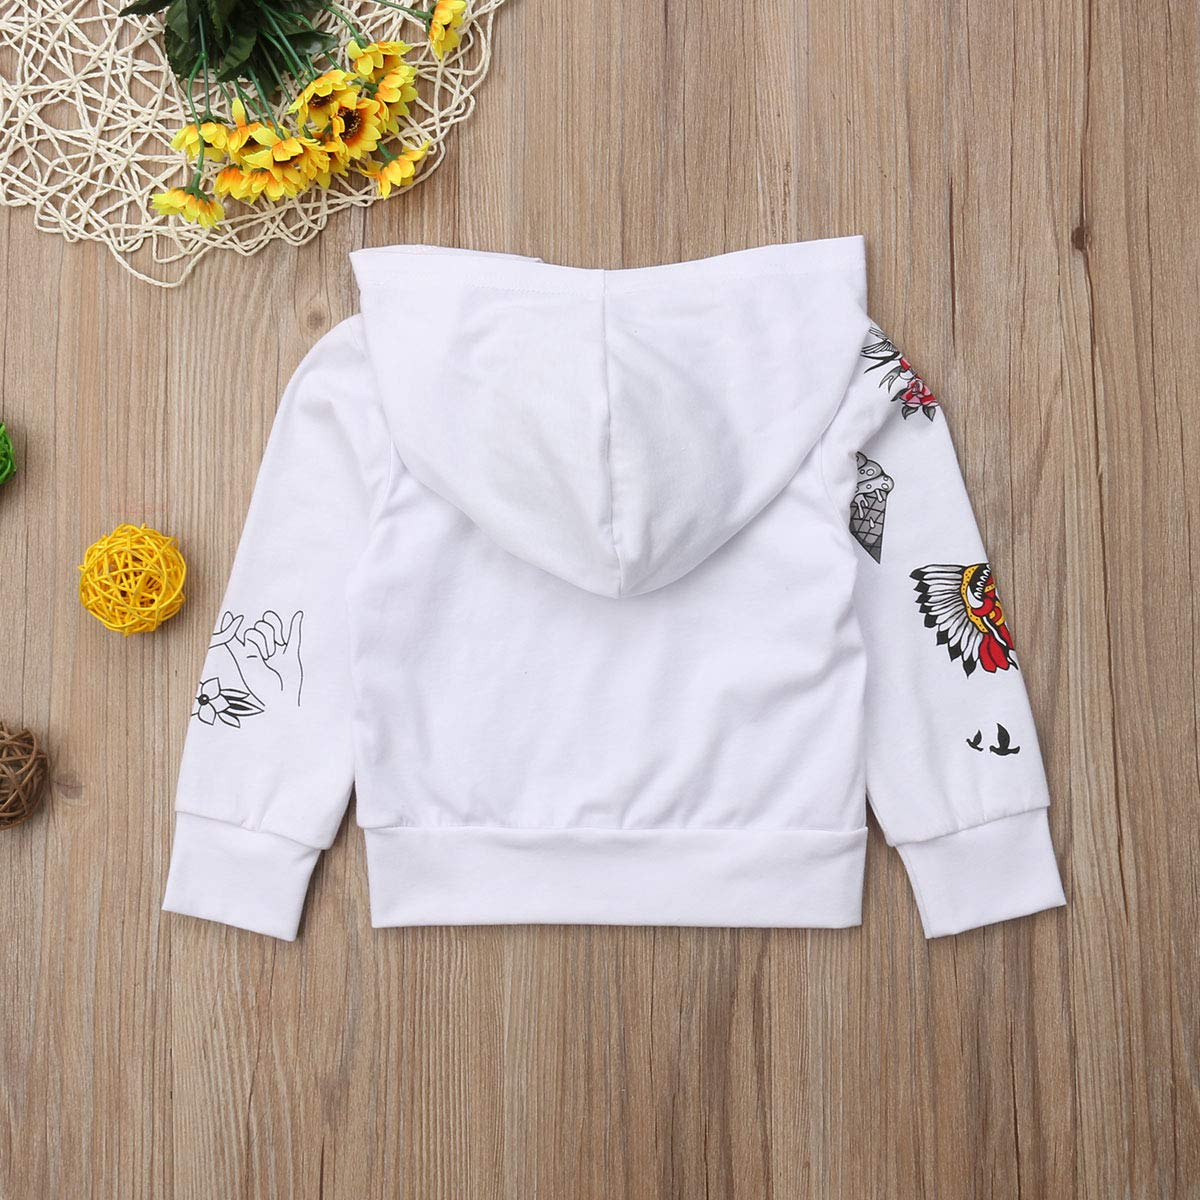 Pybcvrrd Toddler Unisex-Baby 0-5T Hooded Sweater Casual Hoodies with Pocket Long Sleeve Sweatshirt